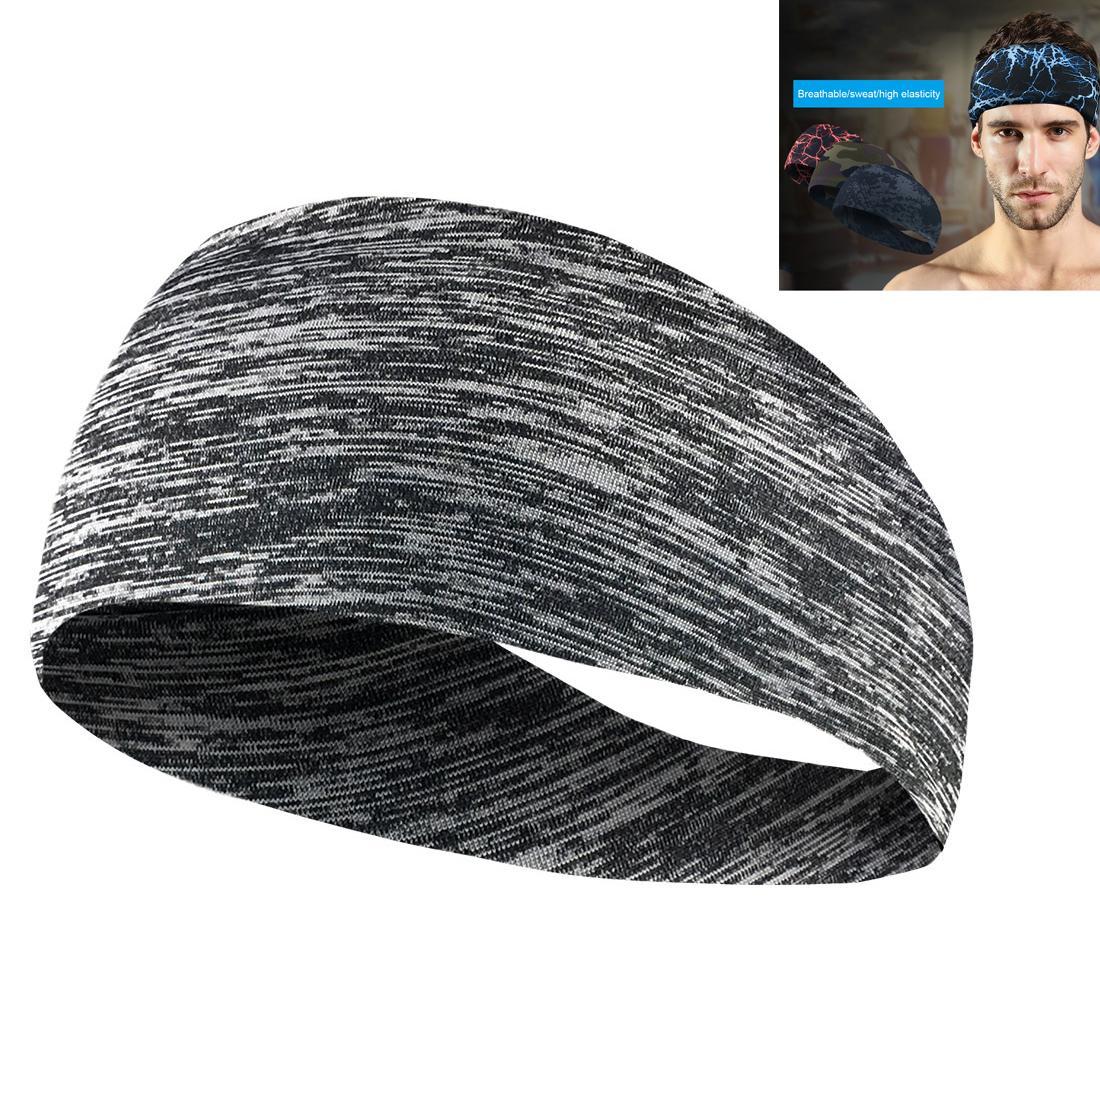 e7ed164c1959 Mens Sports Headbands for sale - Sports Headbands for Men online ...